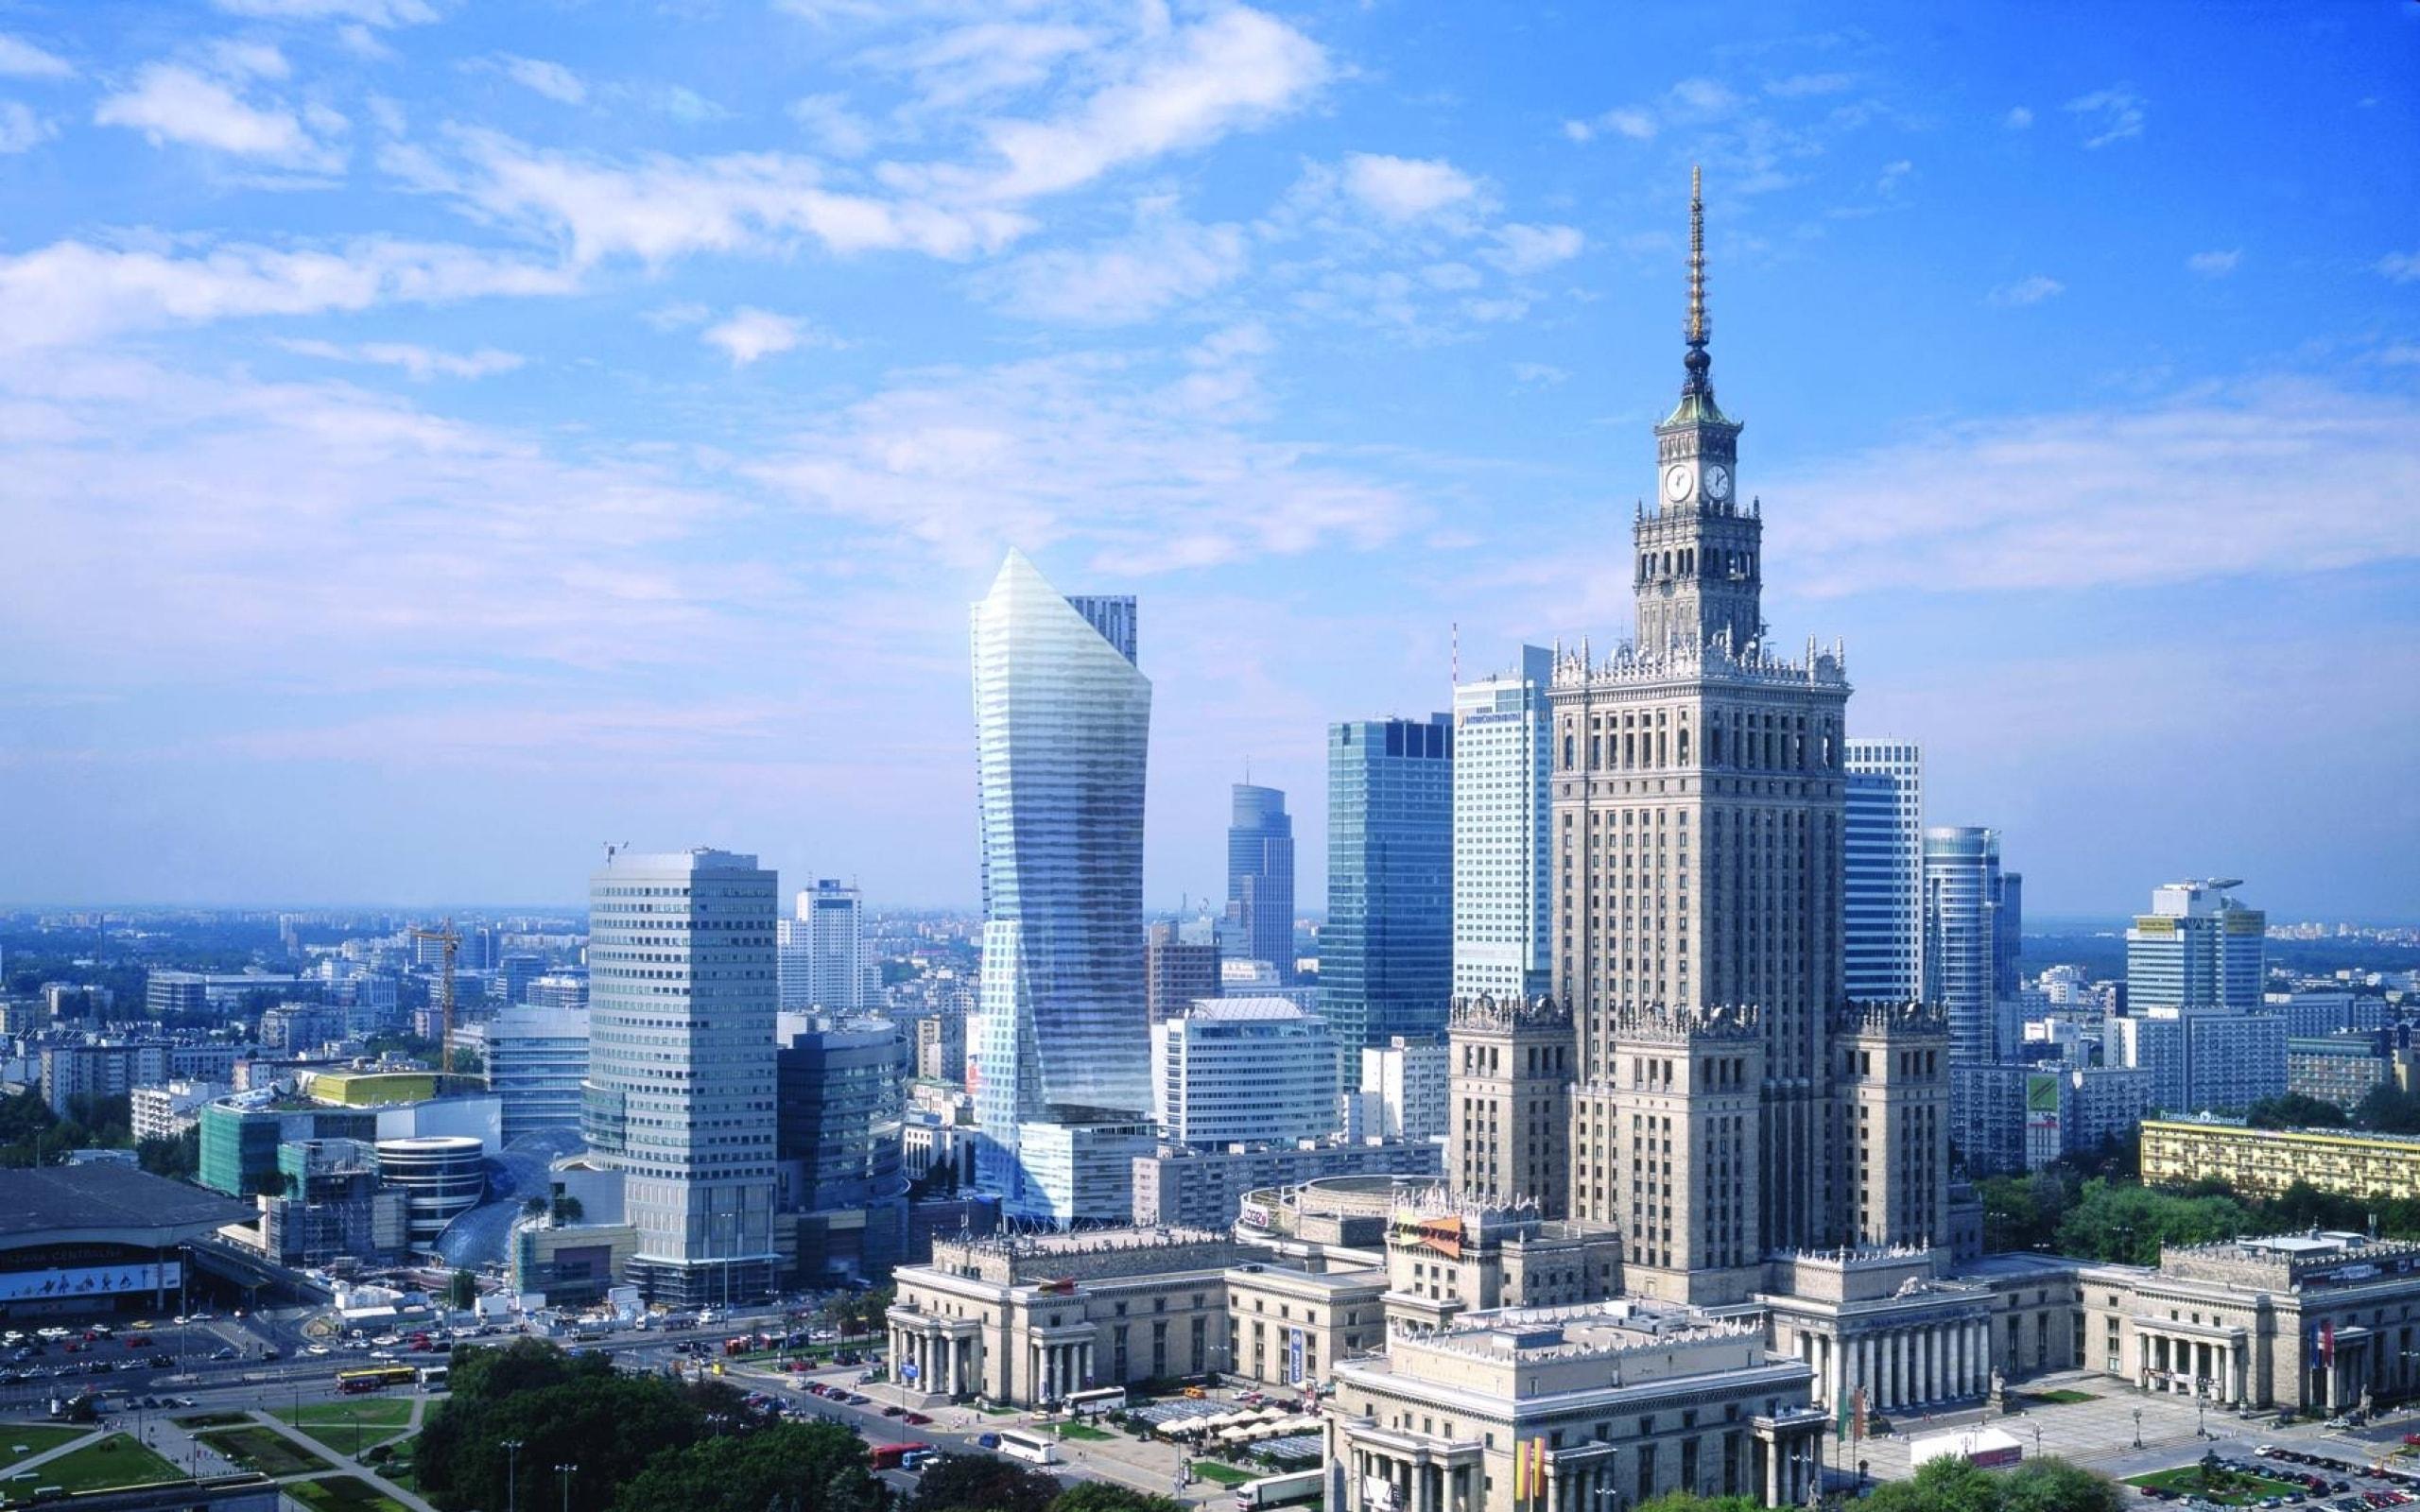 Warsaw widescreen